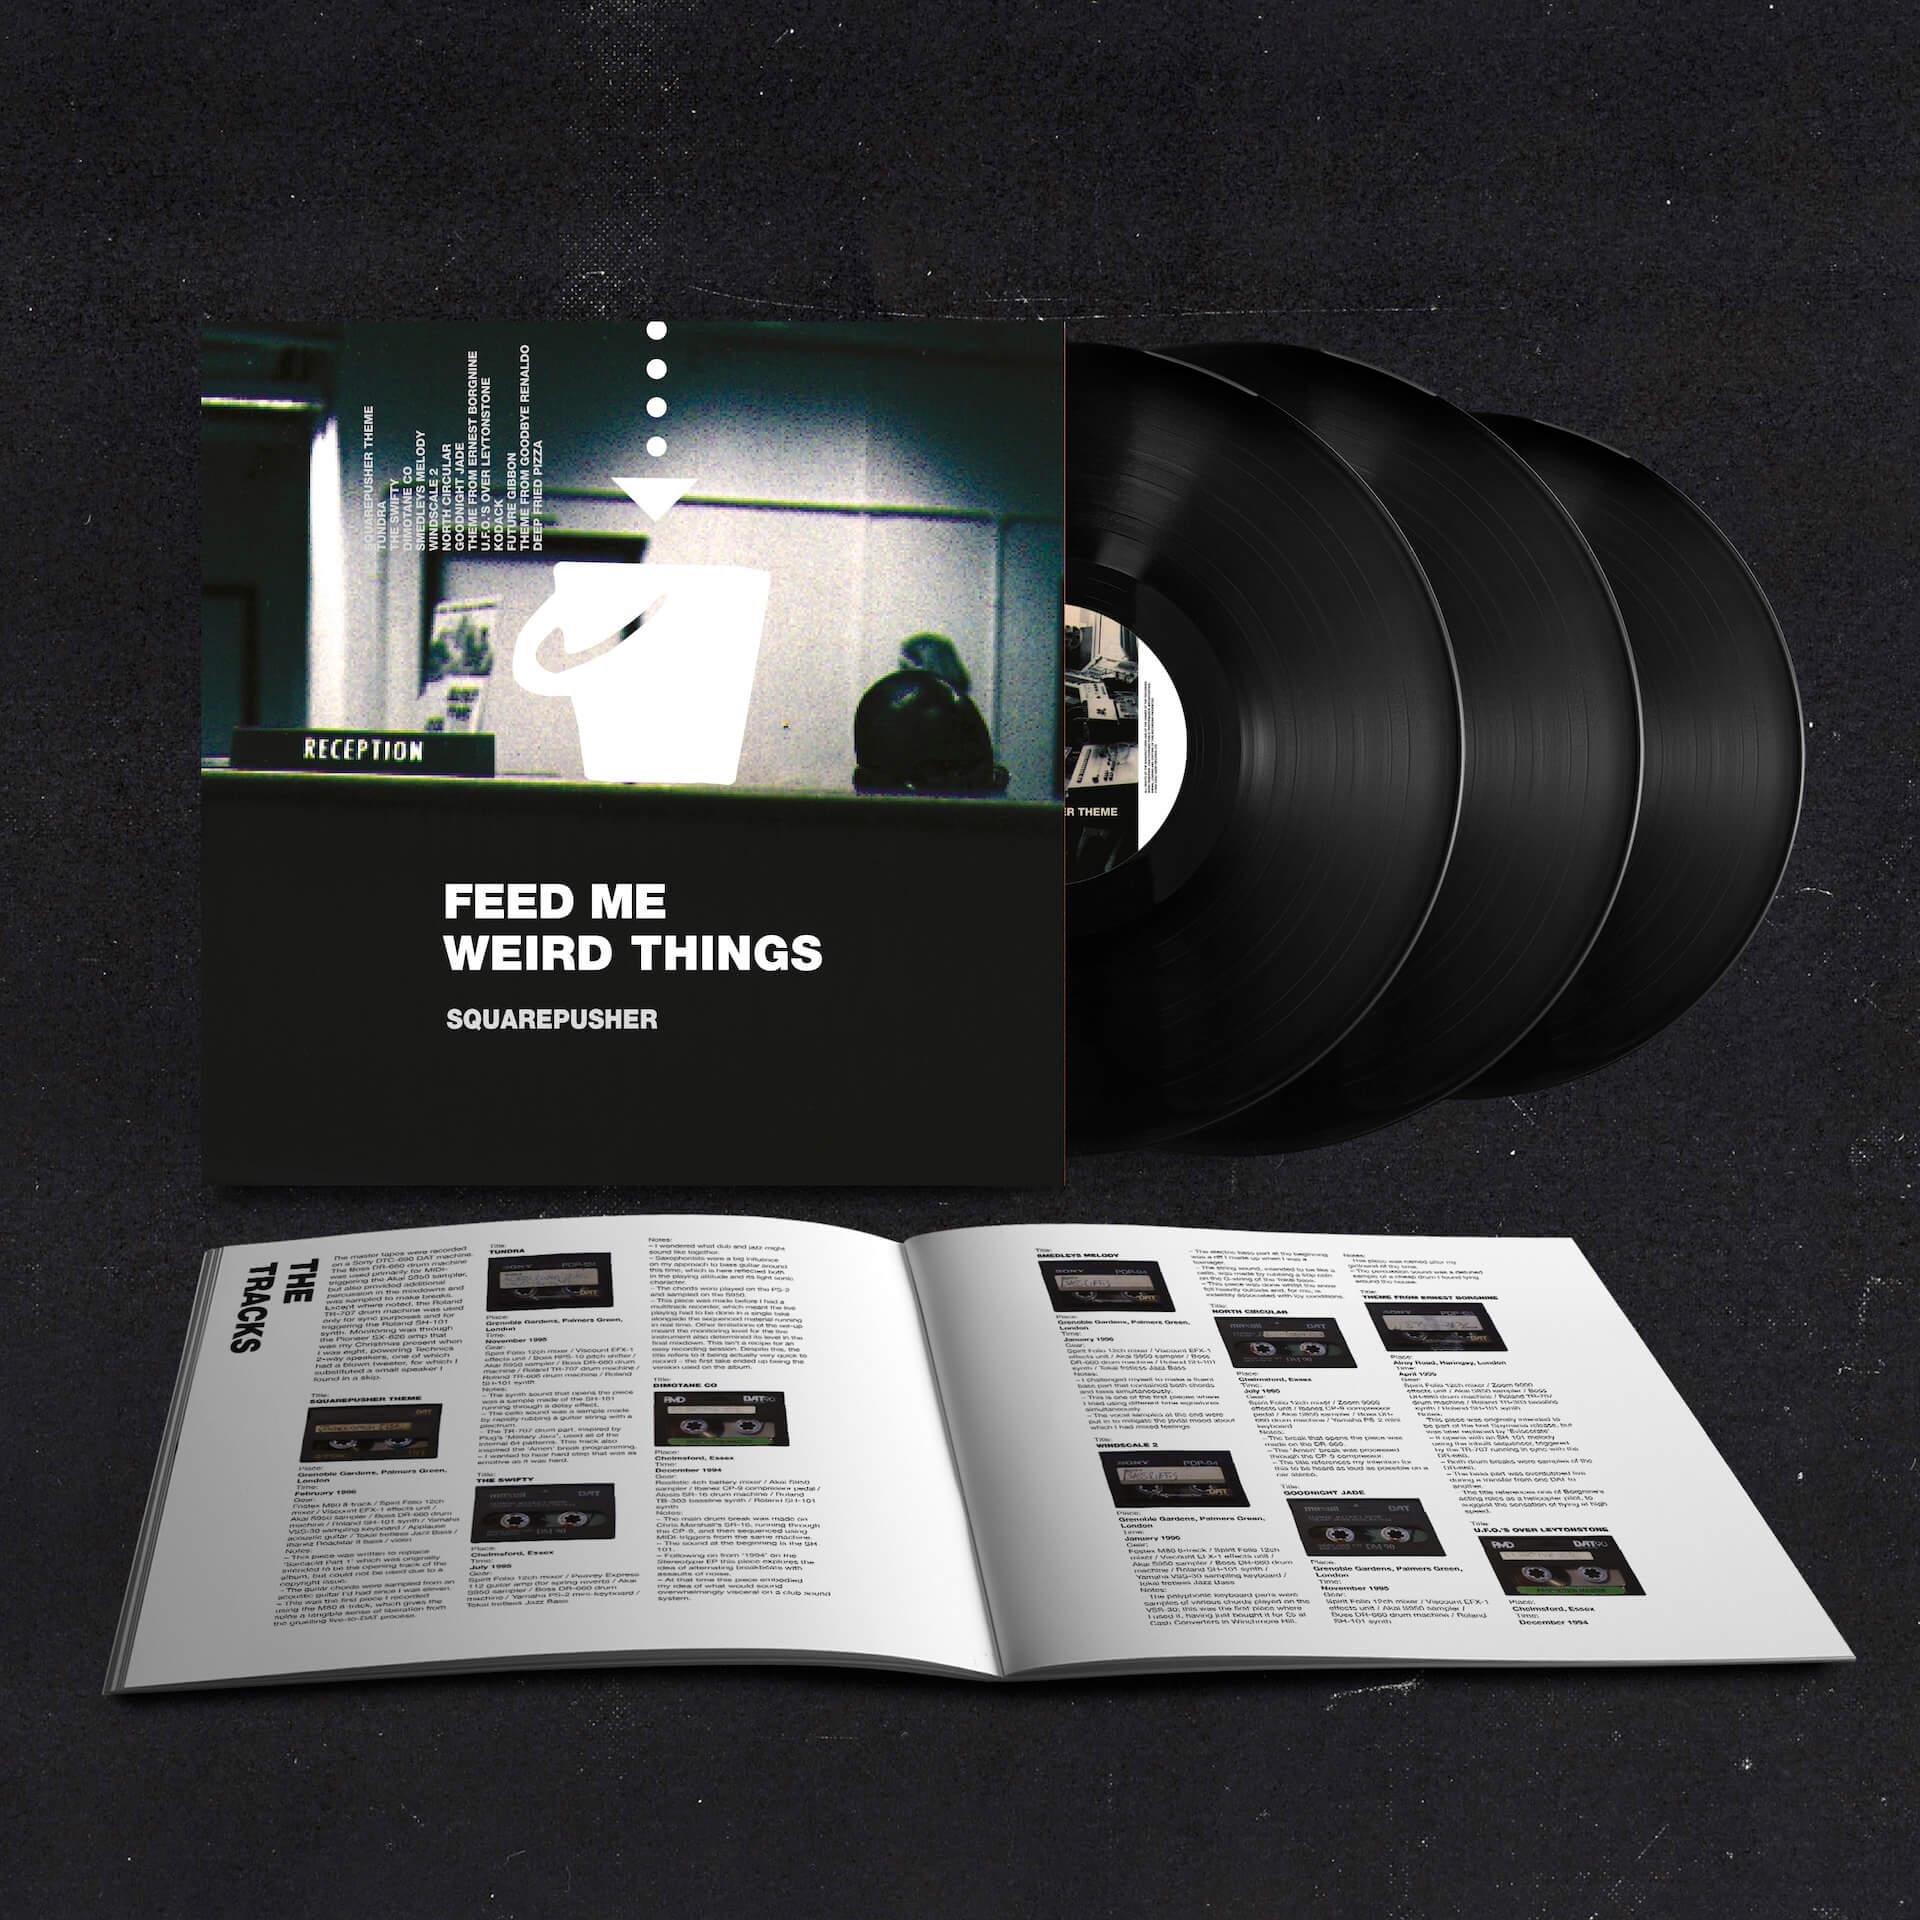 Squarepusherデビューアルバム『Feed Me Weird Things』再発盤が本日ついに発売!待望のサブスクも解禁 music210604_squarepusher_3